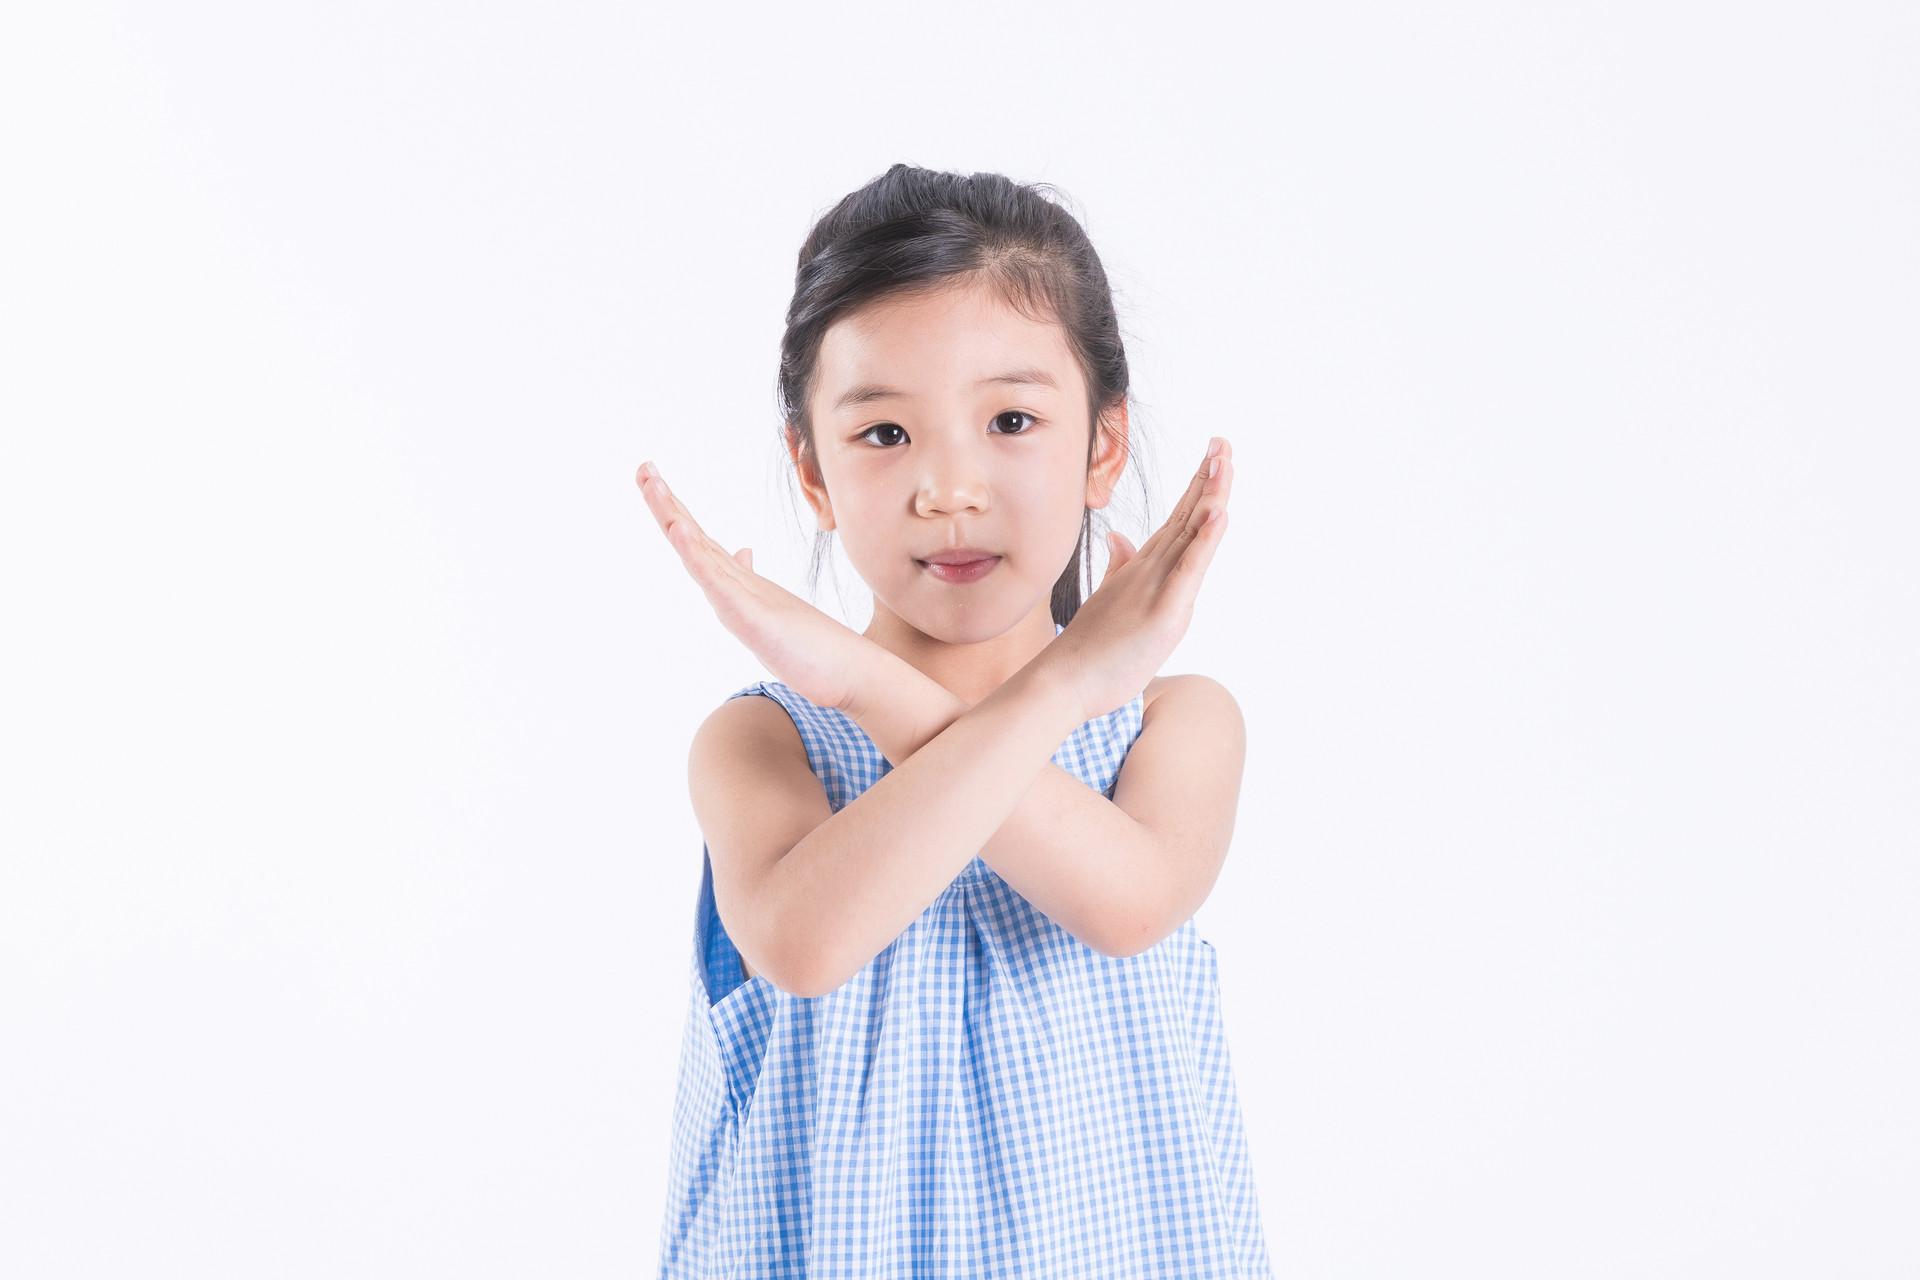 http://www.beaconitnl.com/jiankang/258289.html